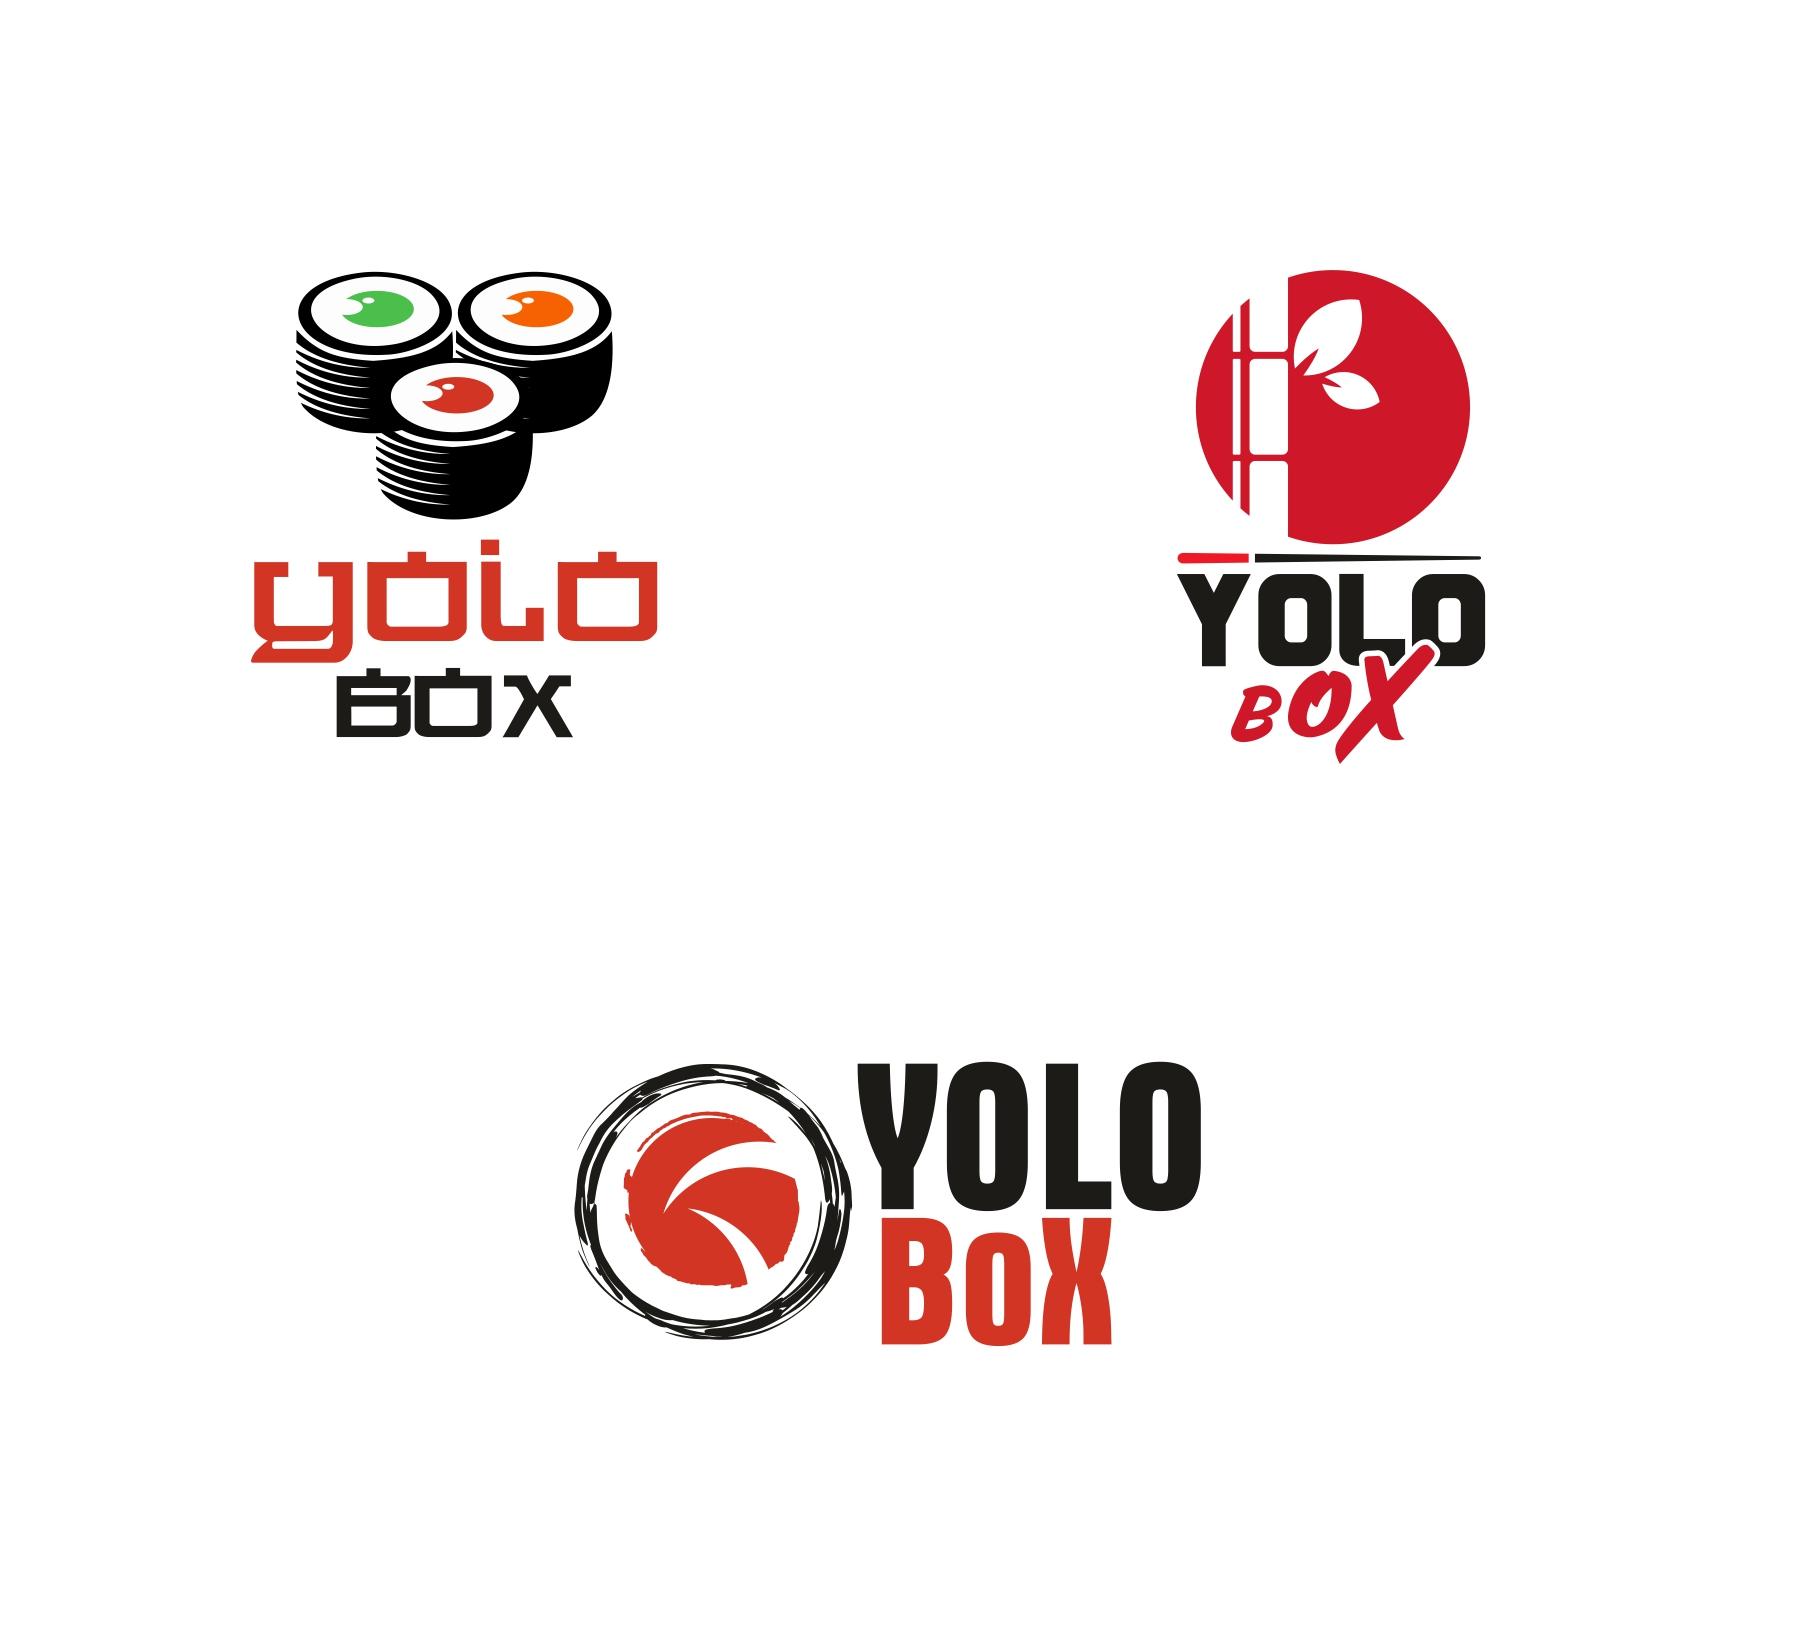 Yolo_box_preview2.jpg